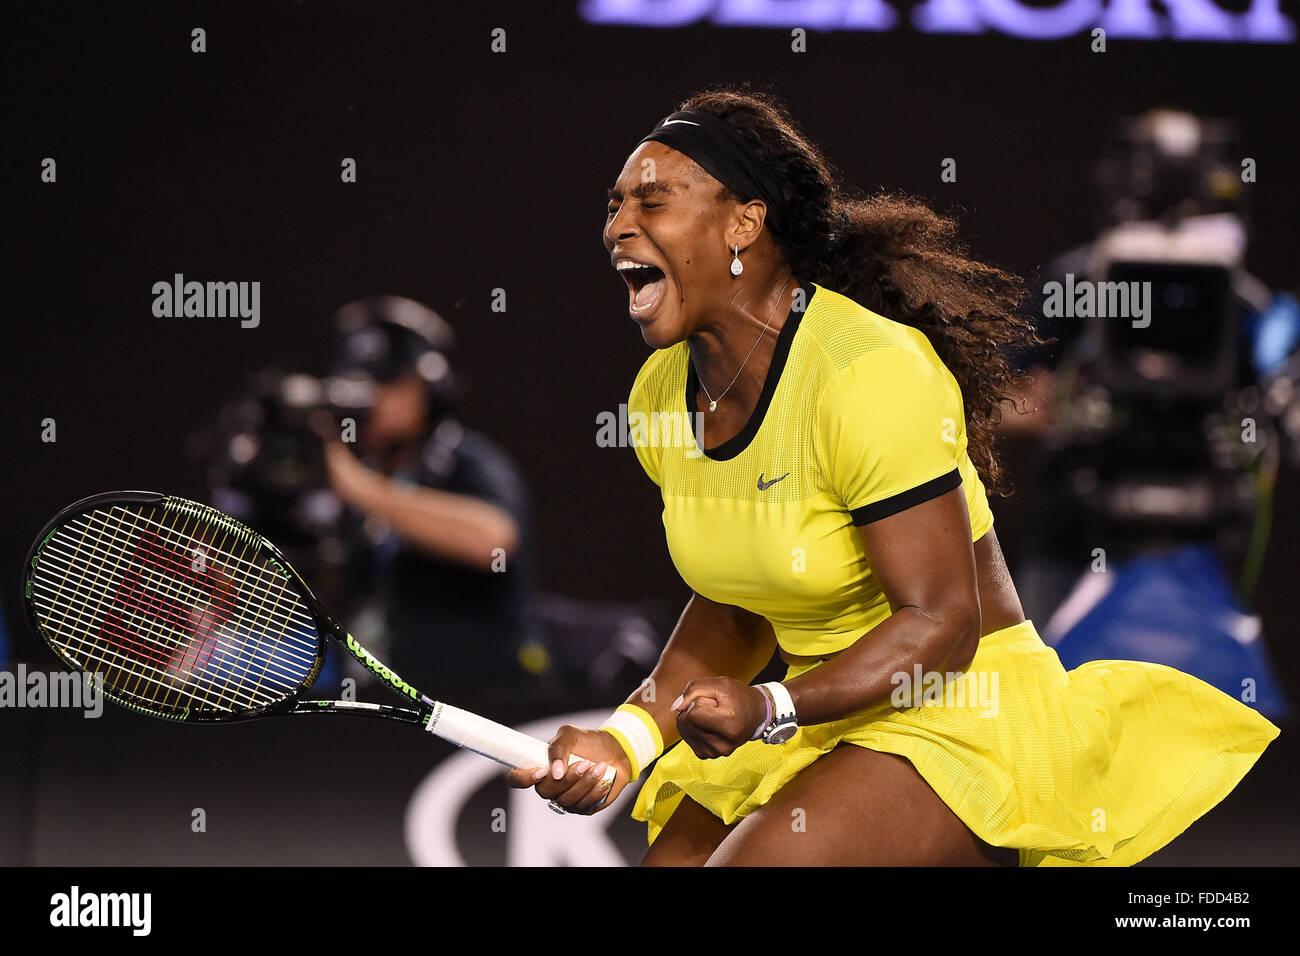 Melbourne Park, Melbourne, Australia. 30 ene, 2016. Final de singles de Mujeres del Abierto de Australia Serena Imagen De Stock